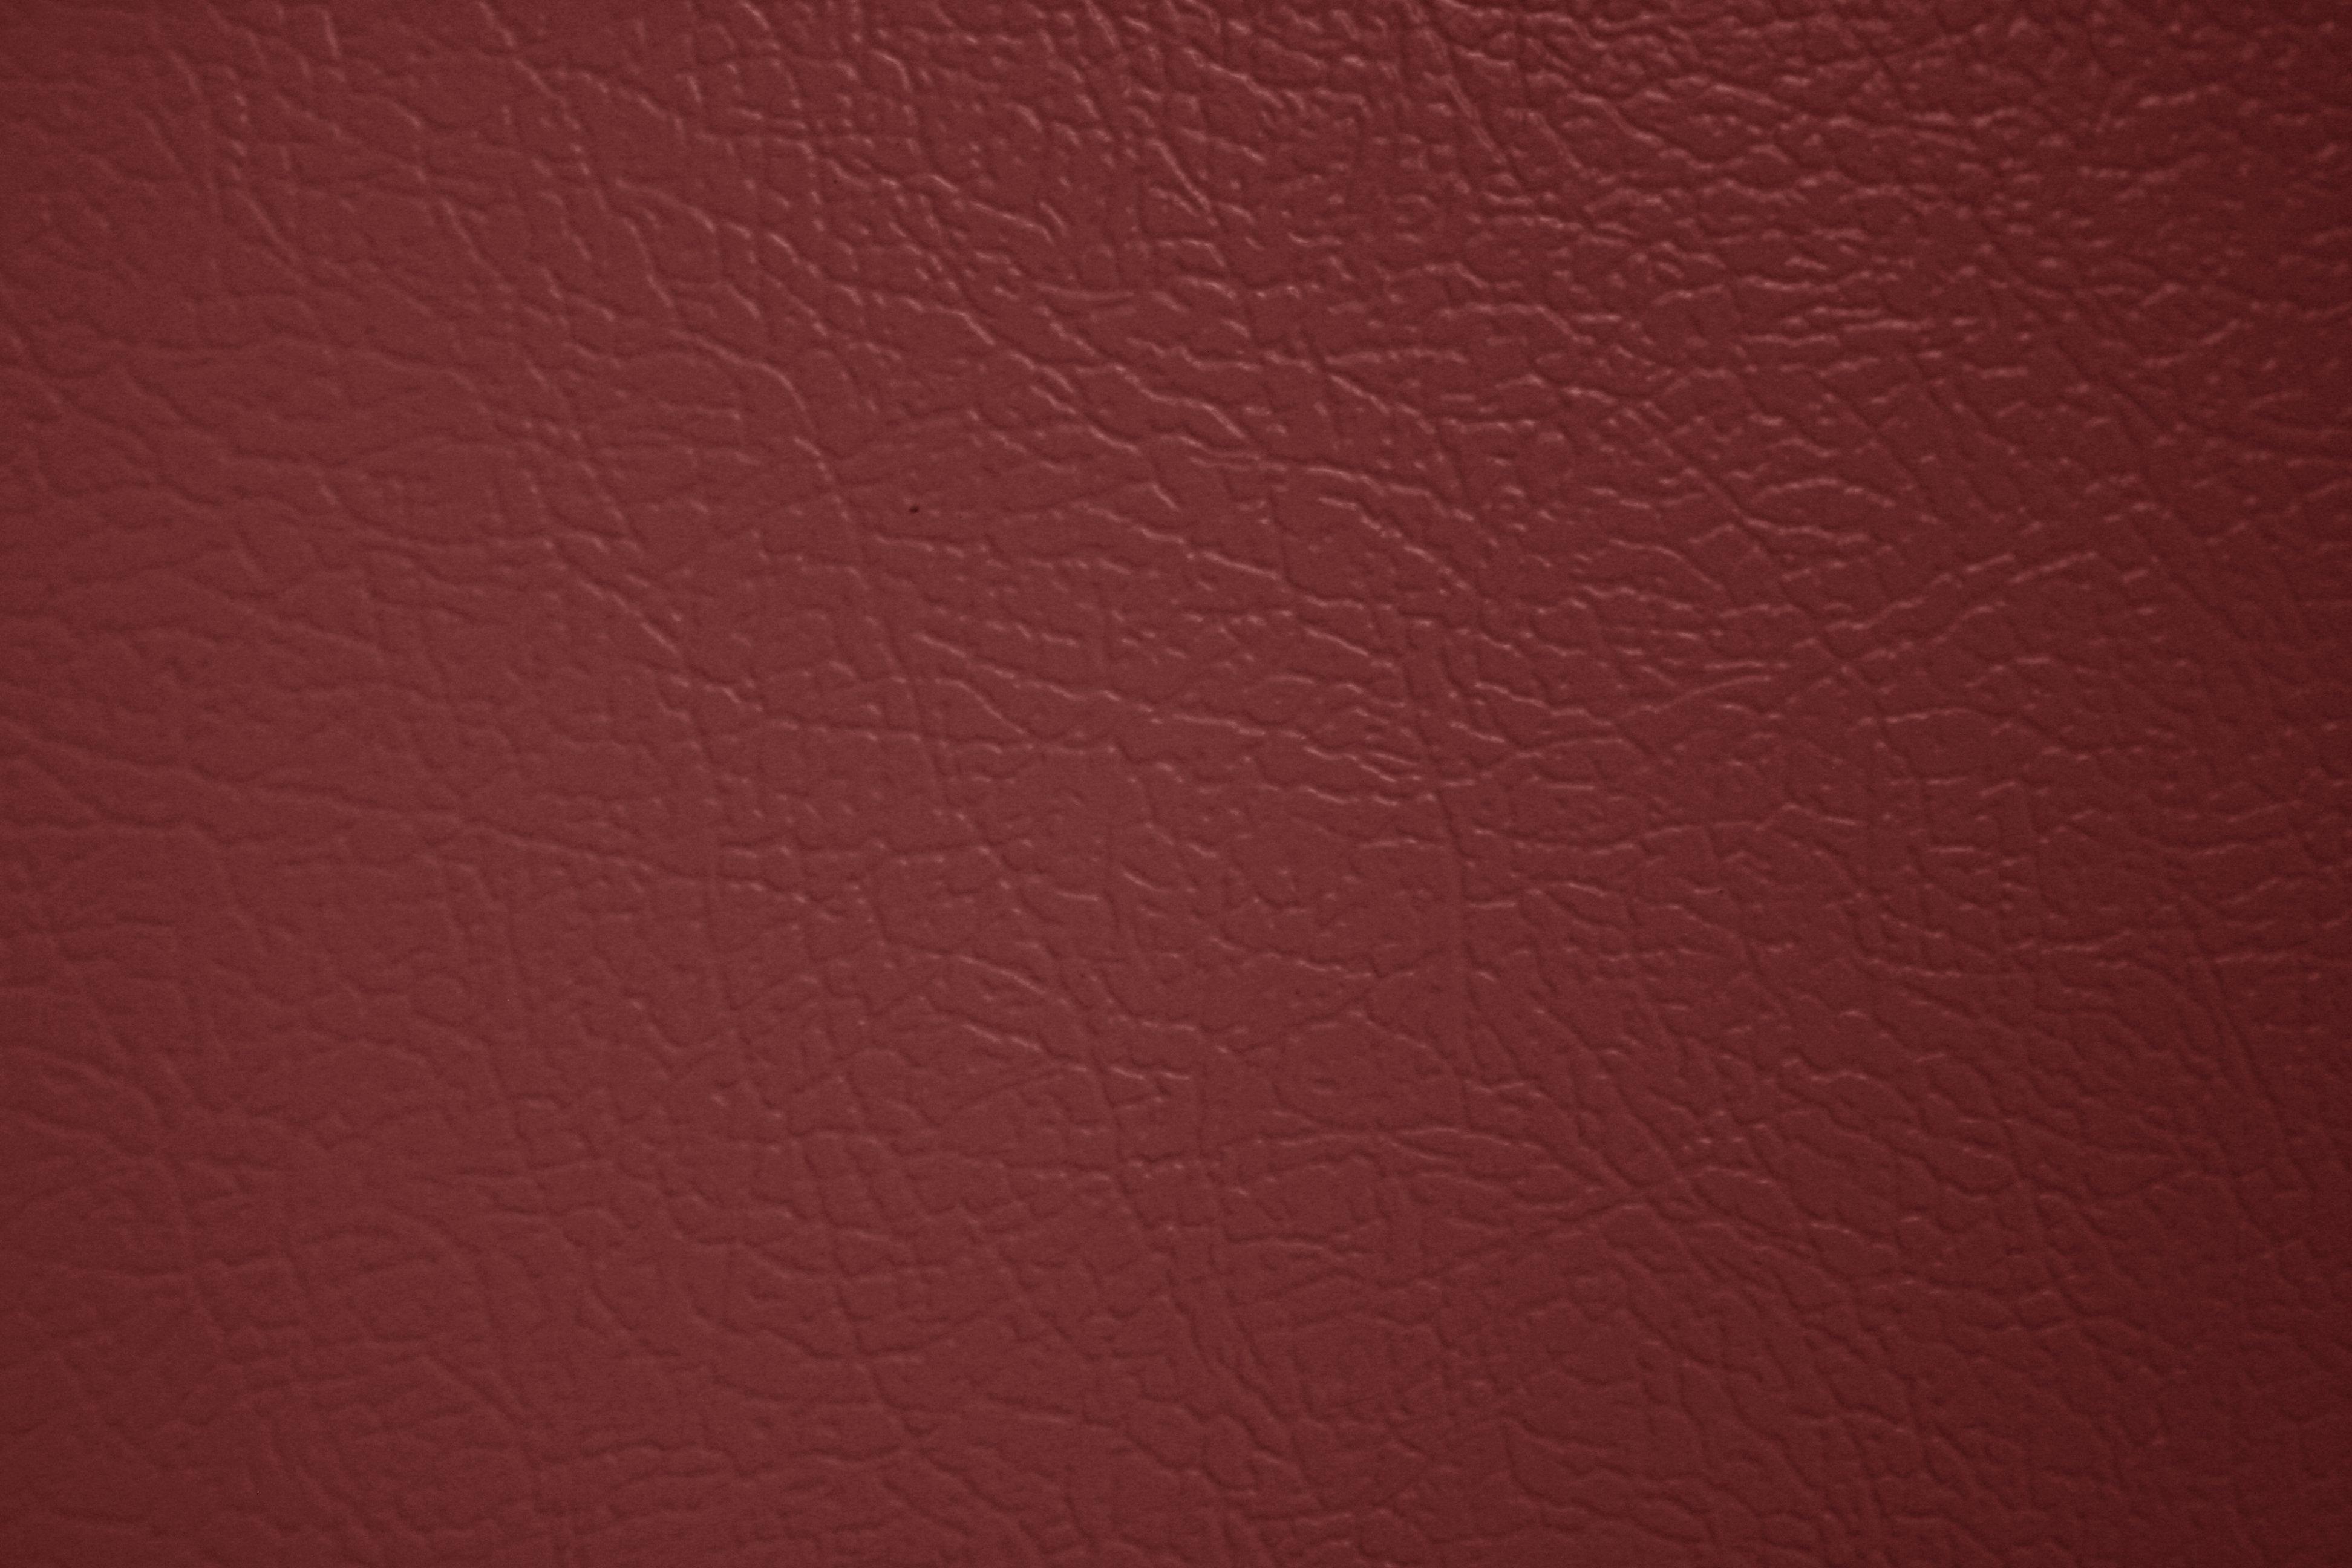 wwwphotos public domaincom20120225maroon faux leather texture 3888x2592